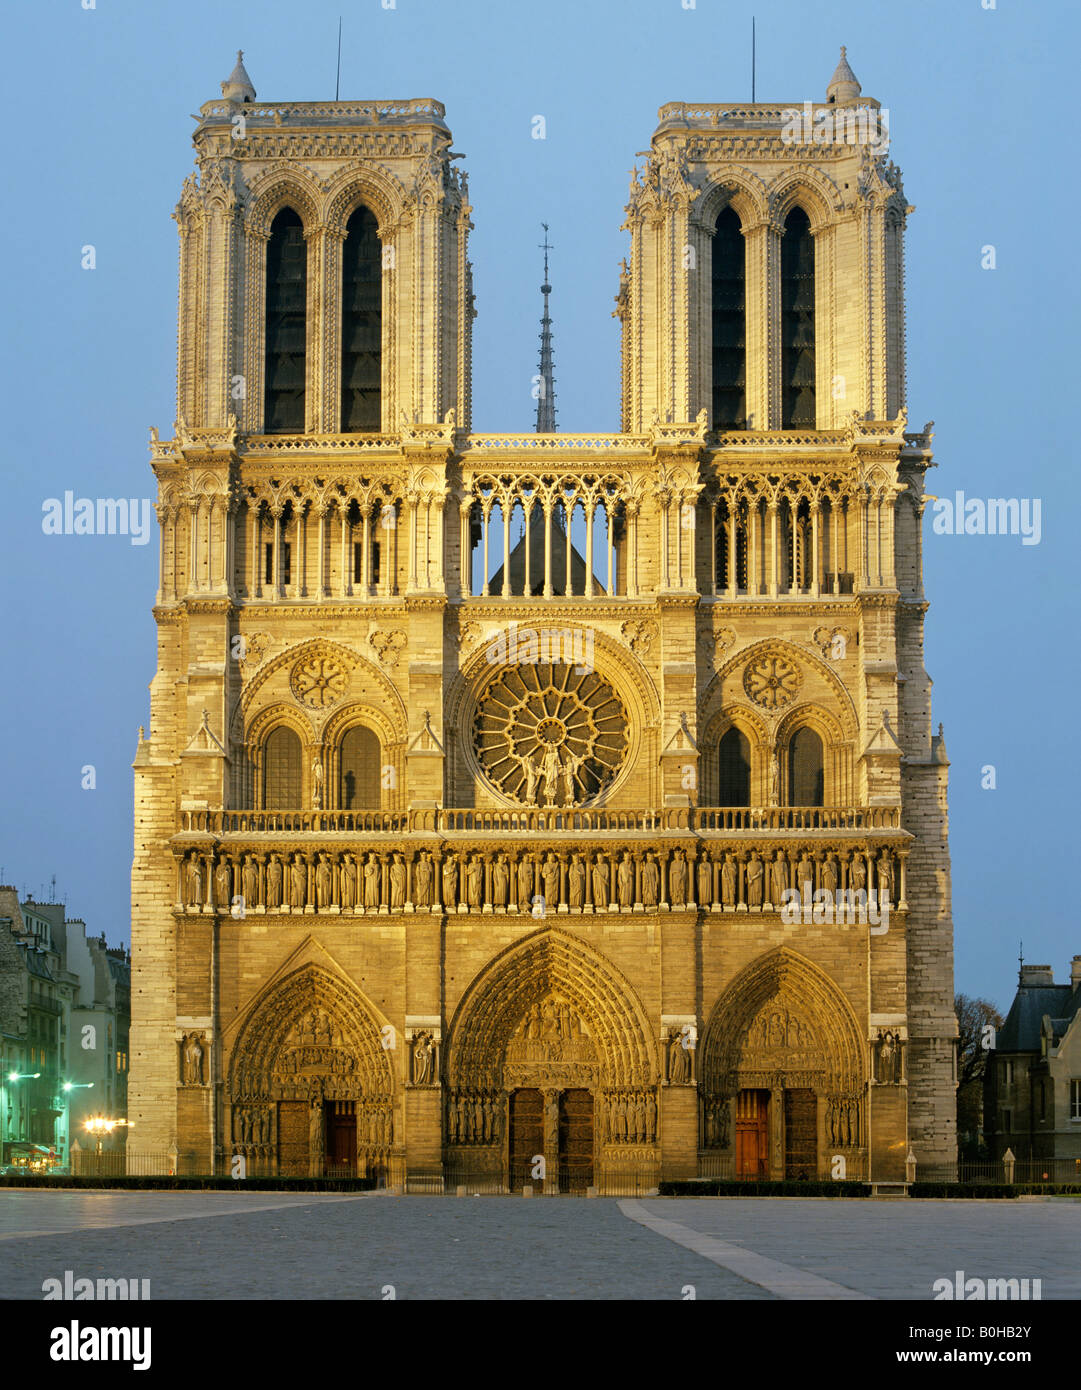 Notre Dame de Paris al crepuscolo, facciata ovest, cattedrale gotica, Parigi, Francia Immagini Stock